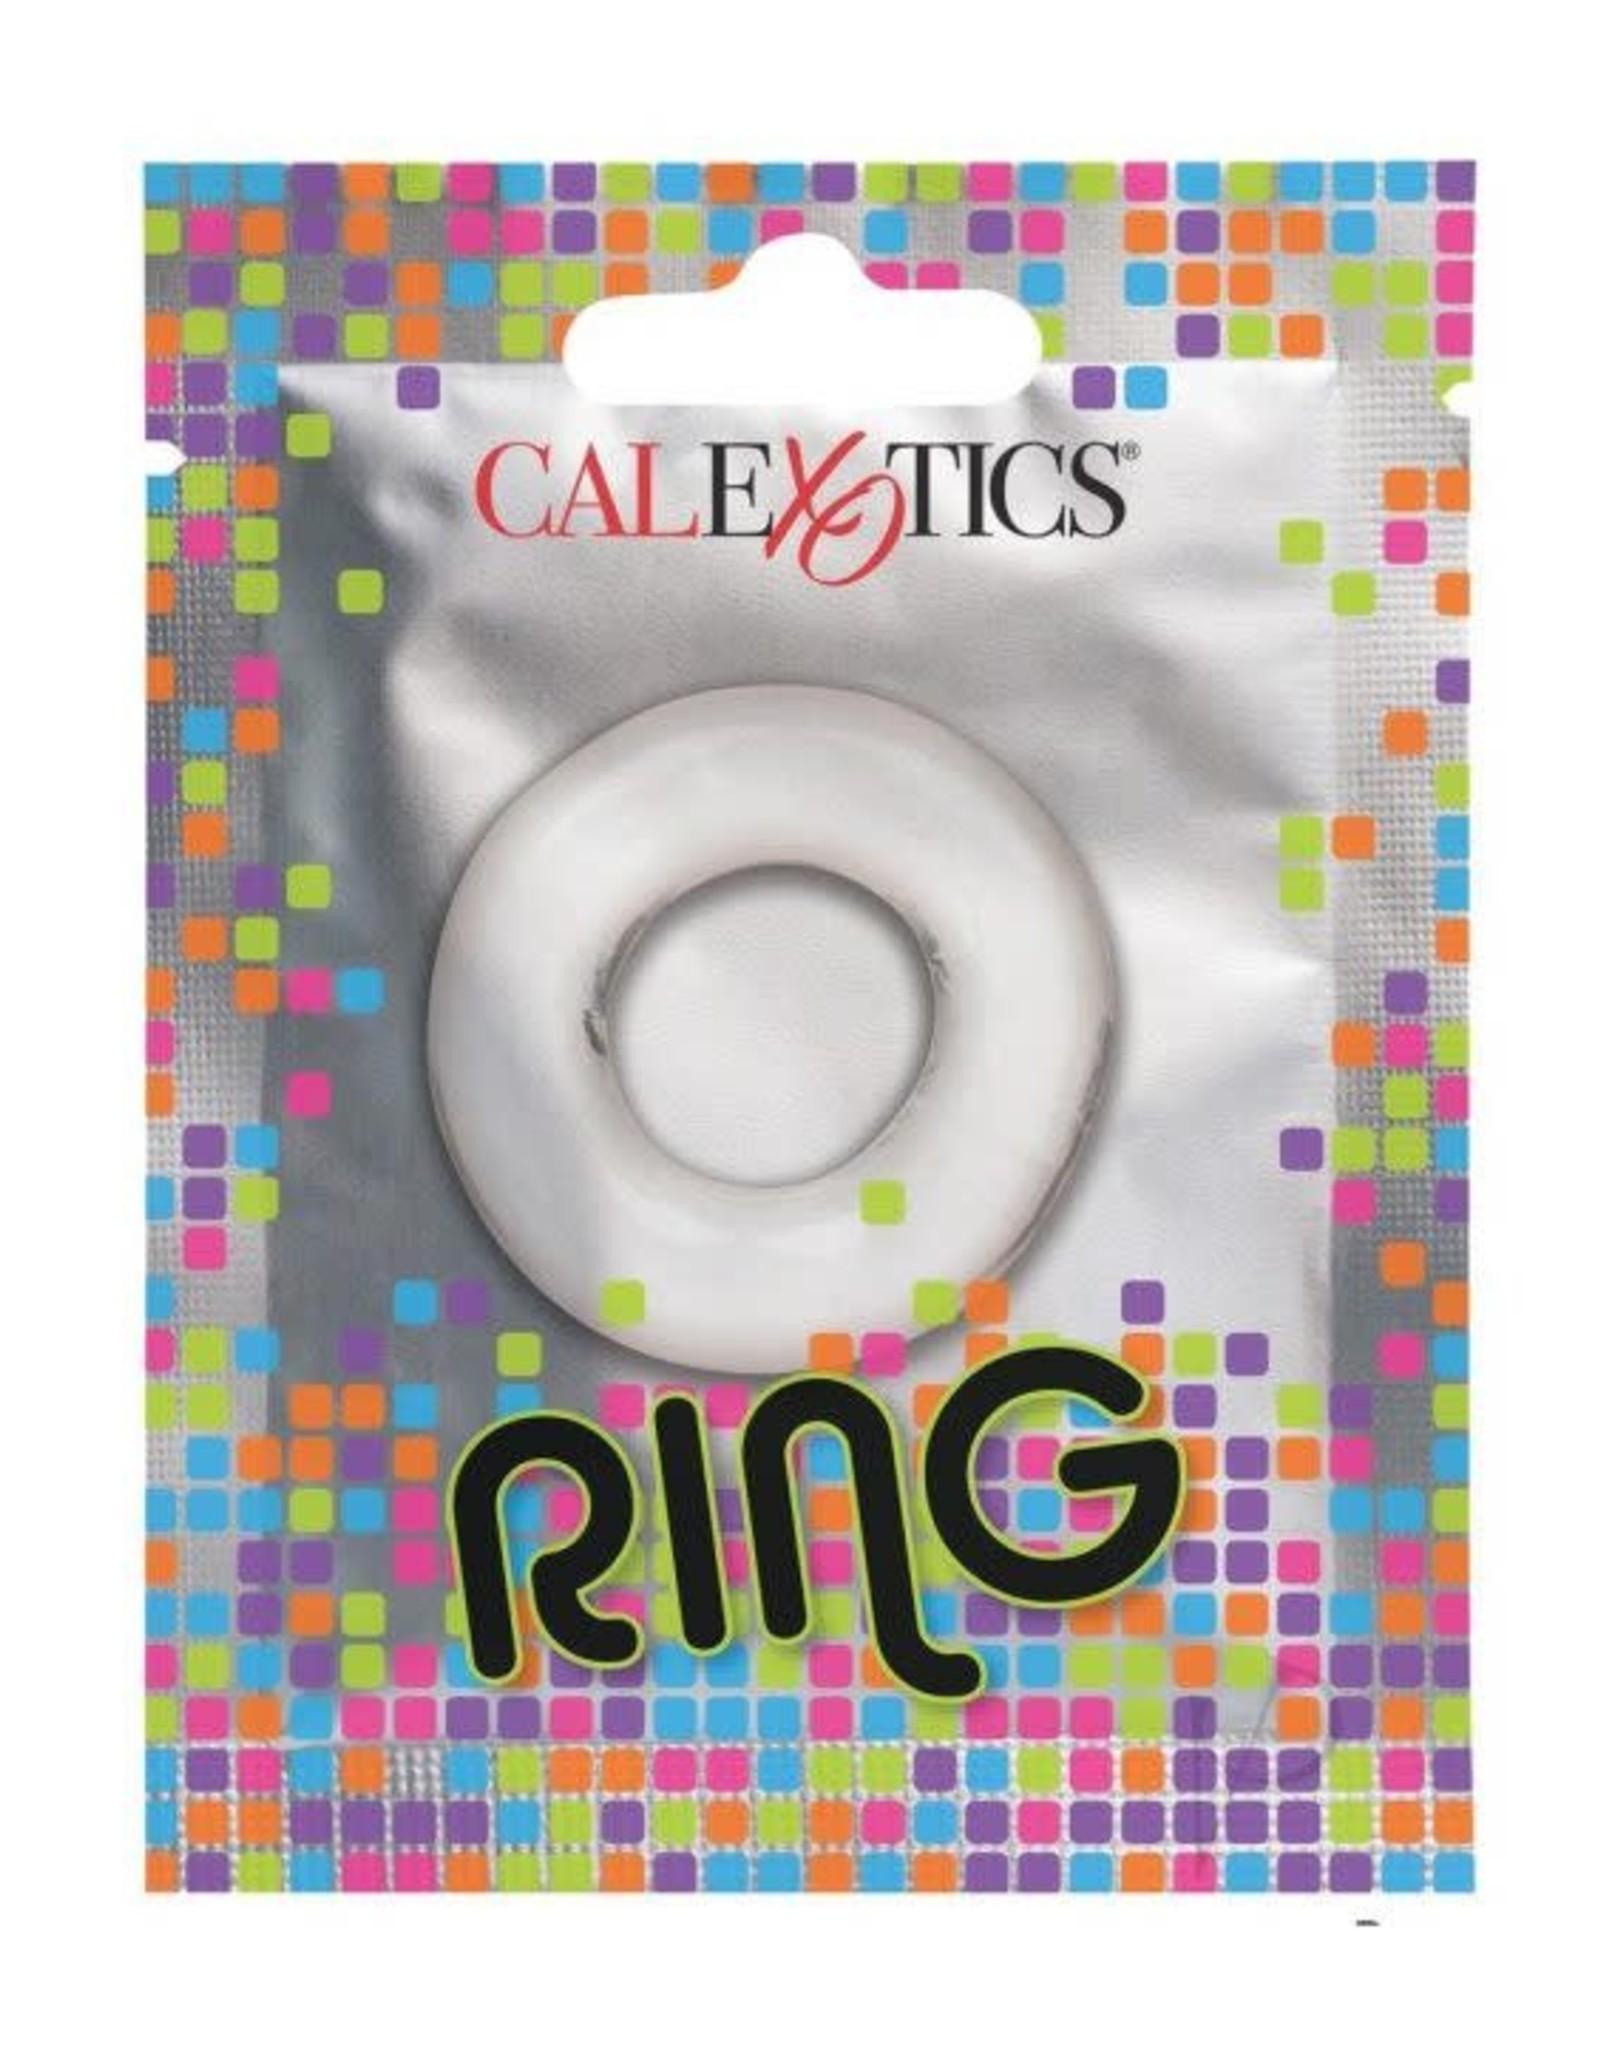 CALEXOTICS CALEXOTICS - FOIL PACK RING - CLEAR